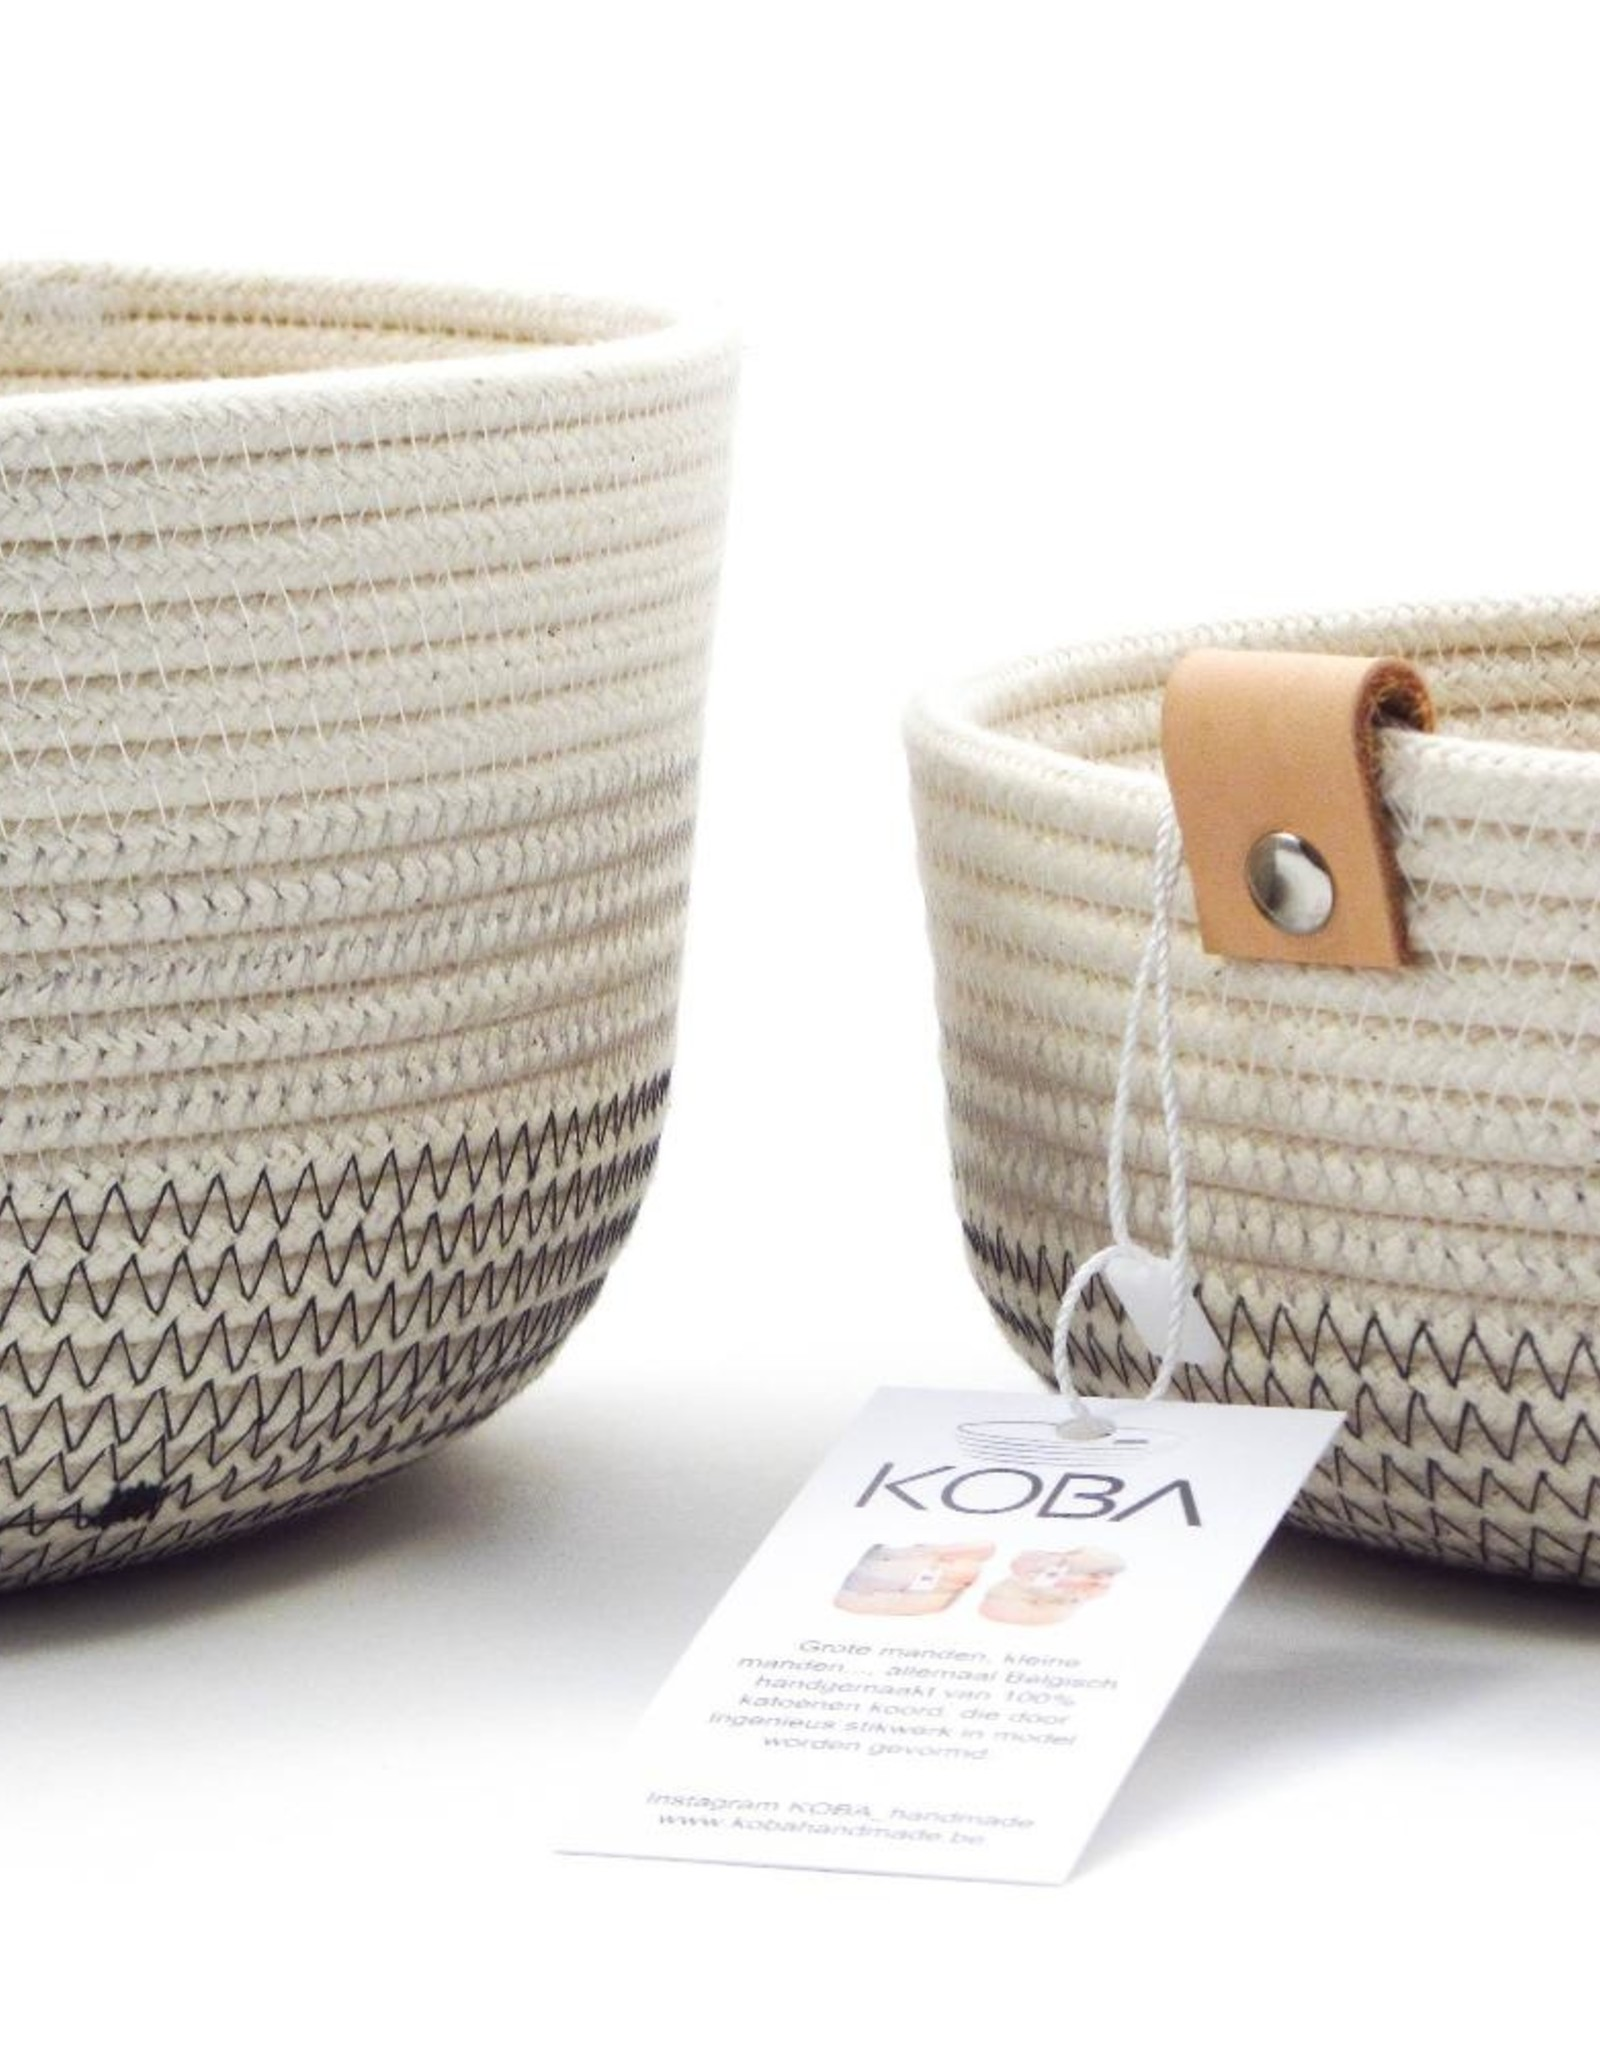 Koba Handmade Bowl Medium Low-shades of grey 25x7cm